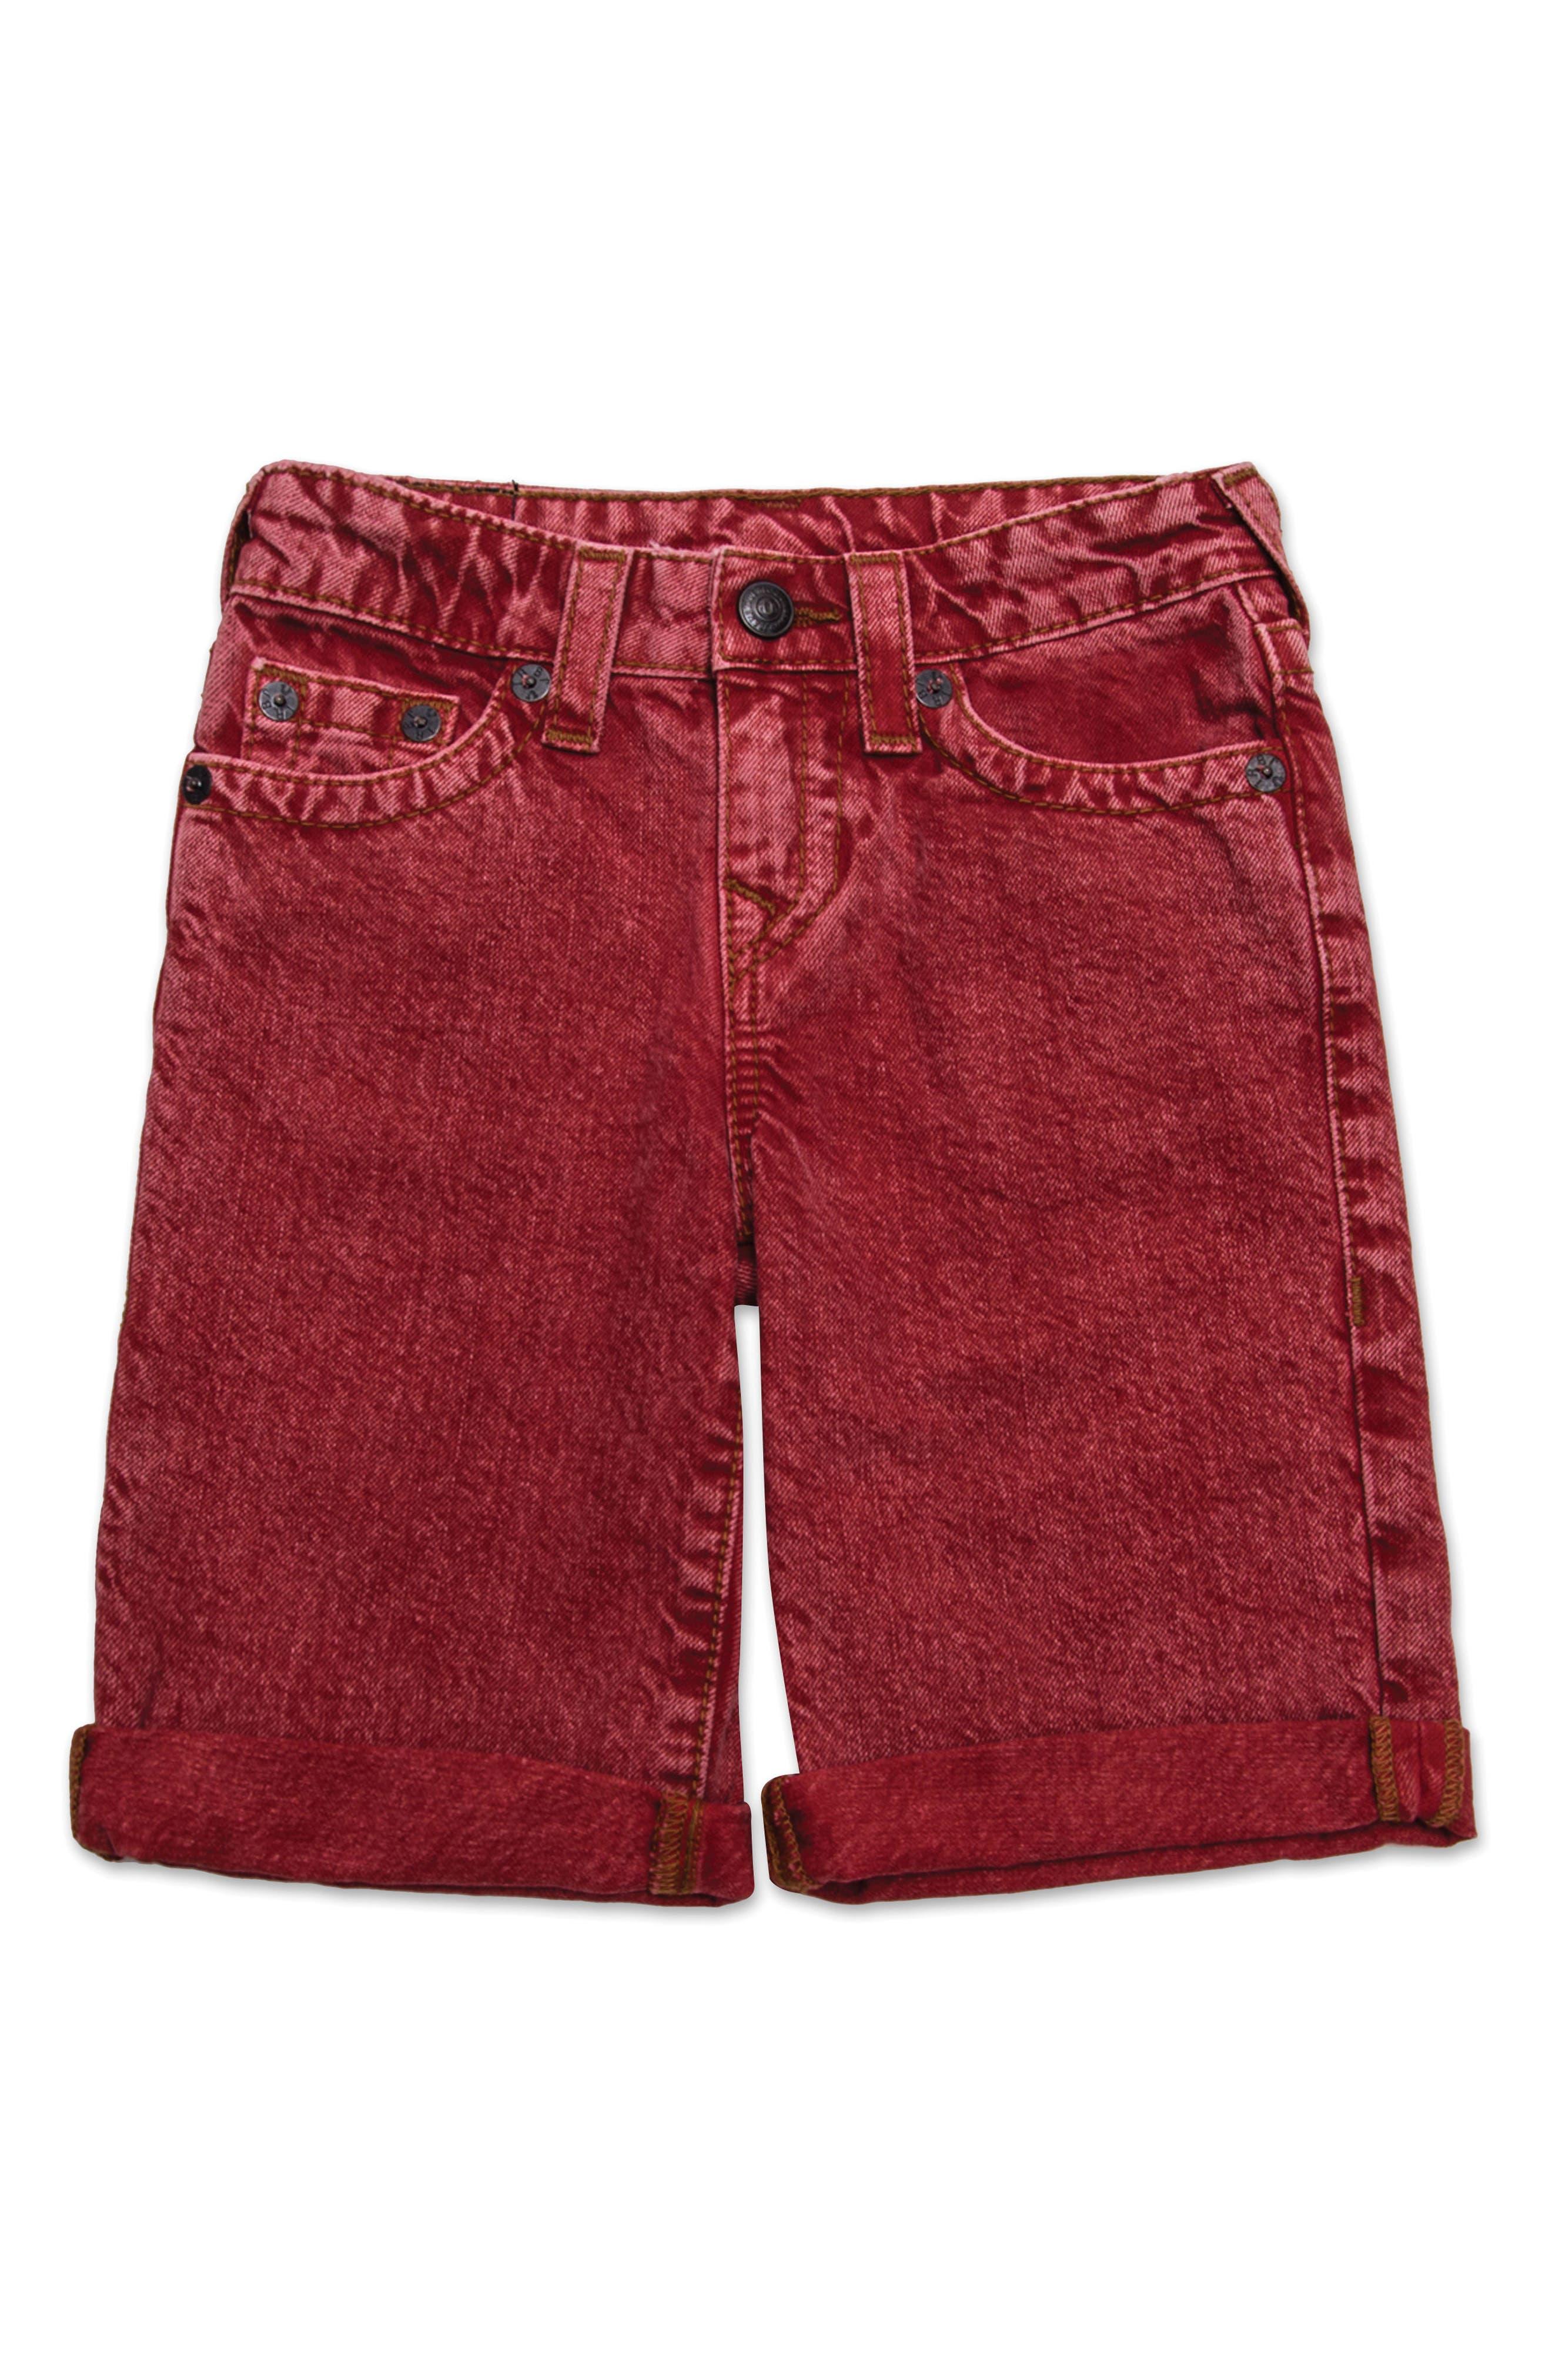 Geno Denim Shorts,                         Main,                         color, Washed Red